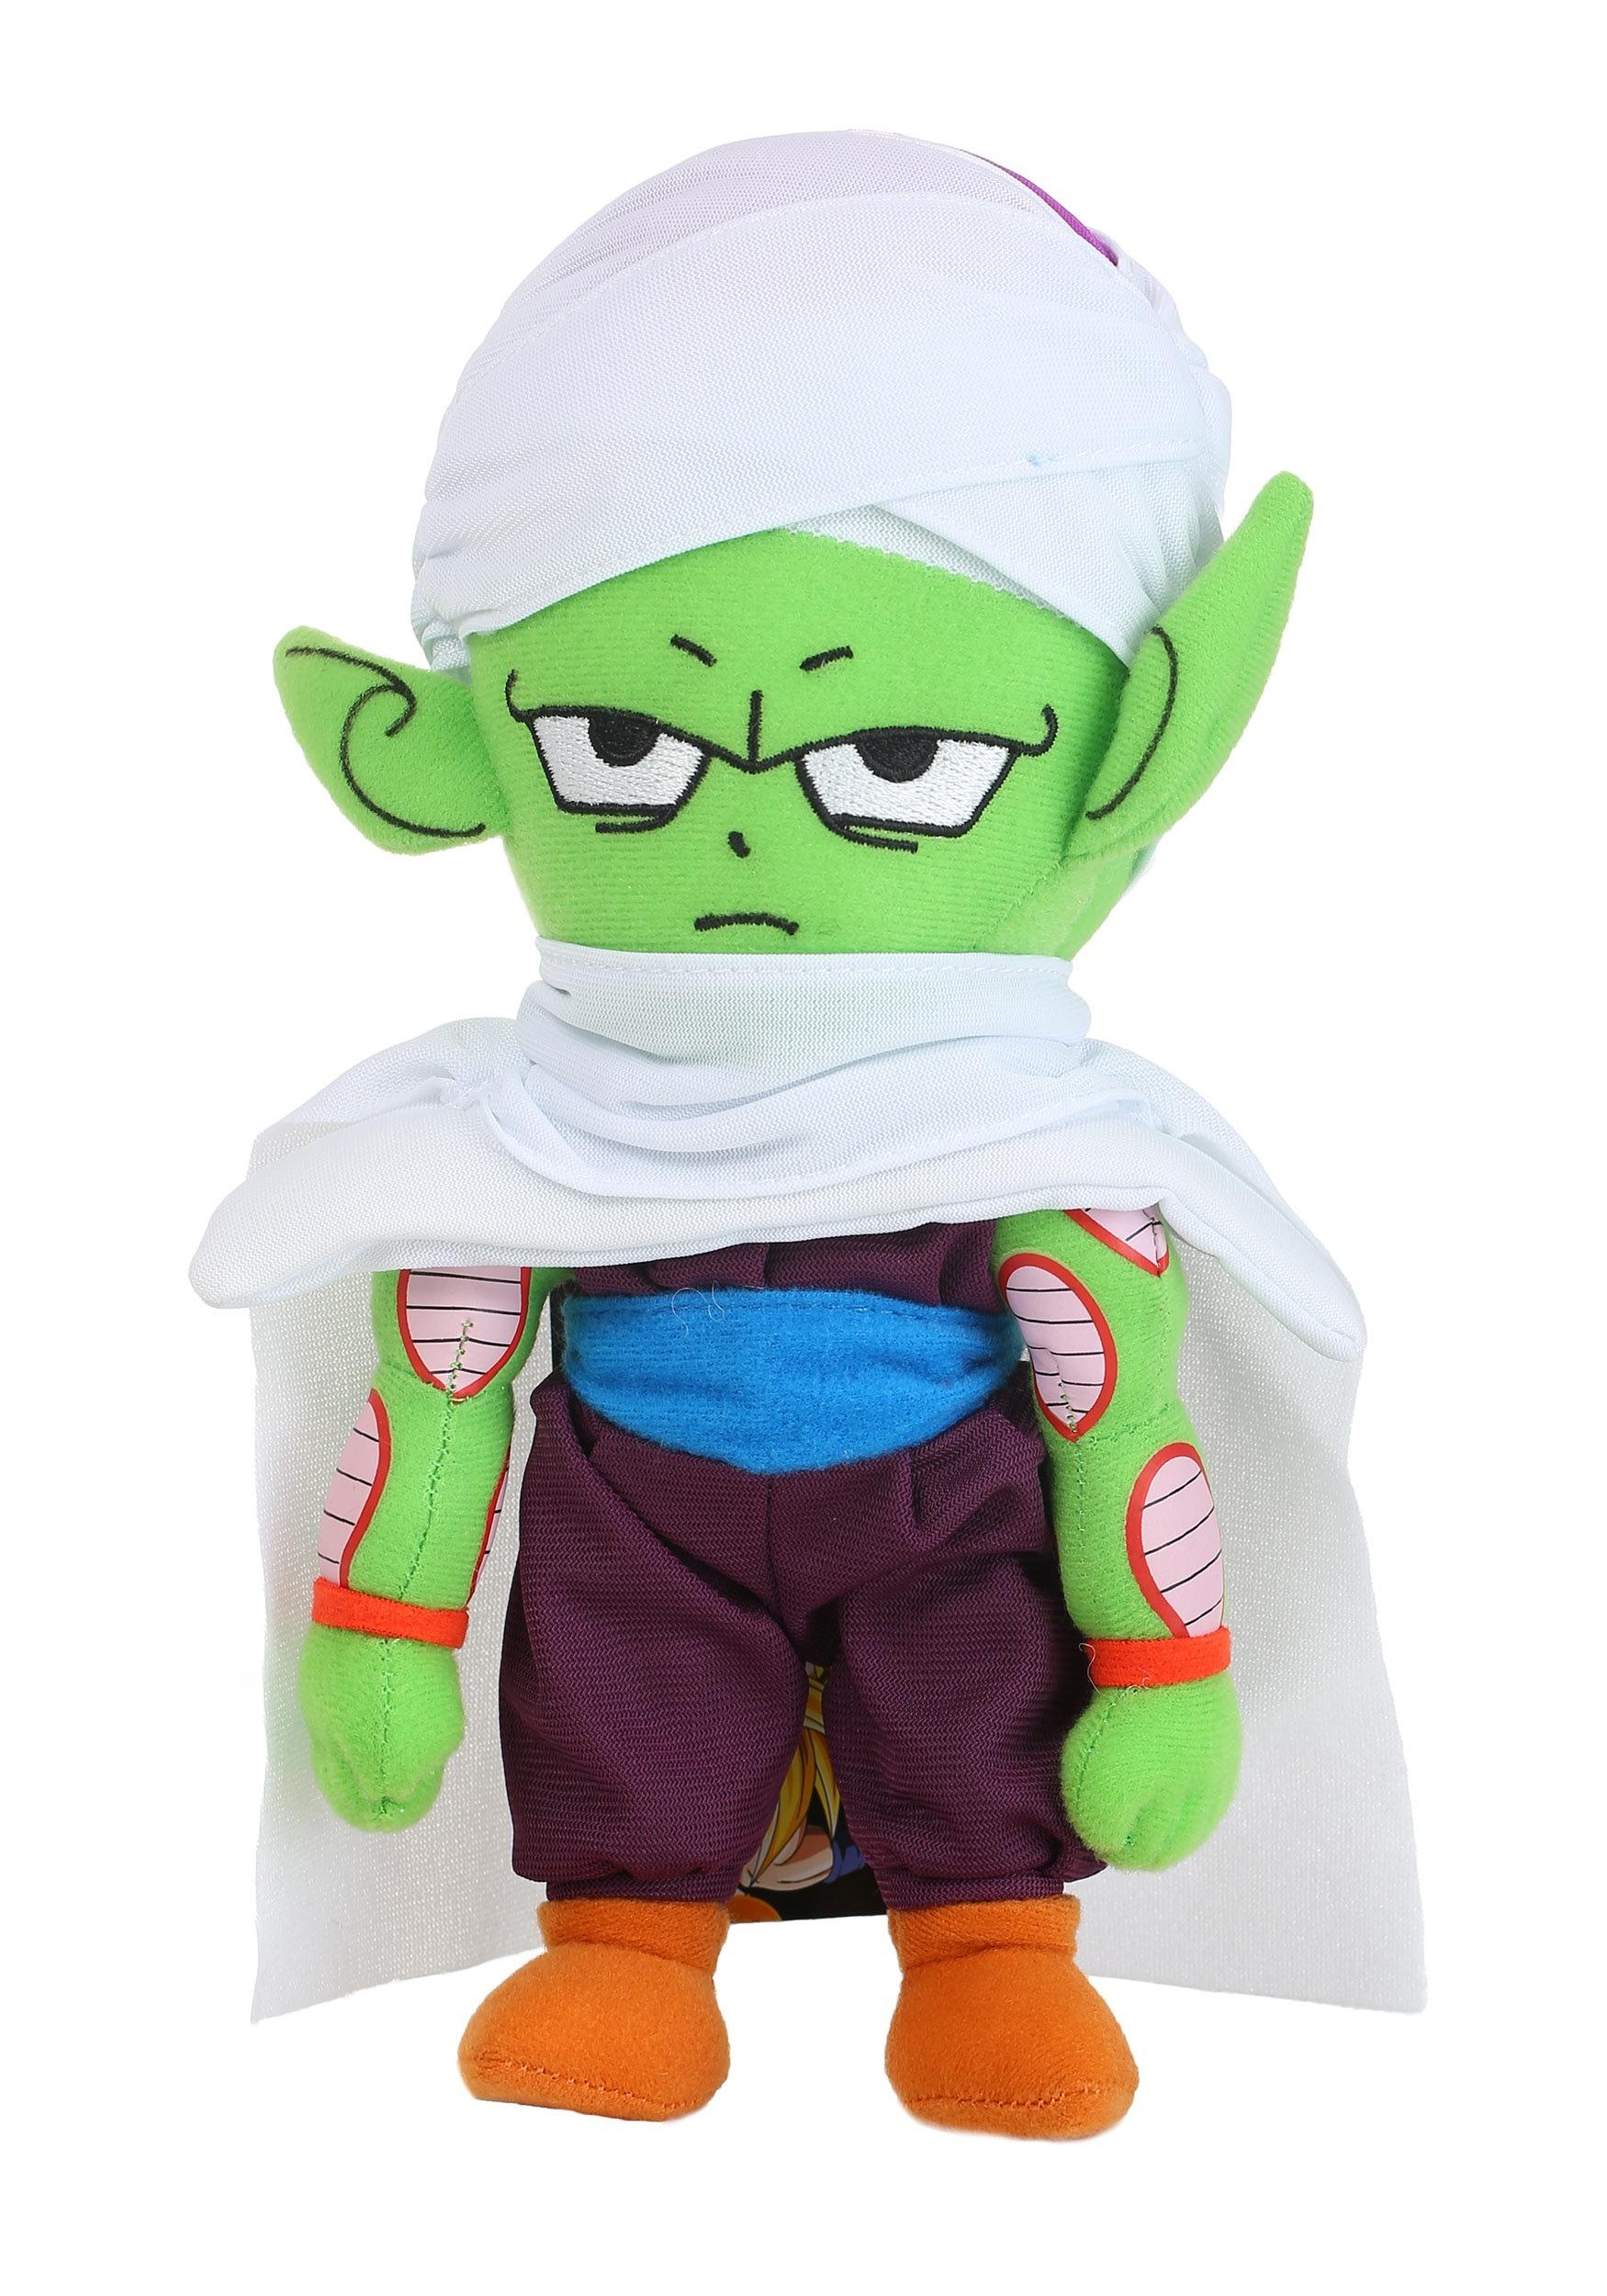 Dragon Ball Z Piccolo 9 Stuffed Doll